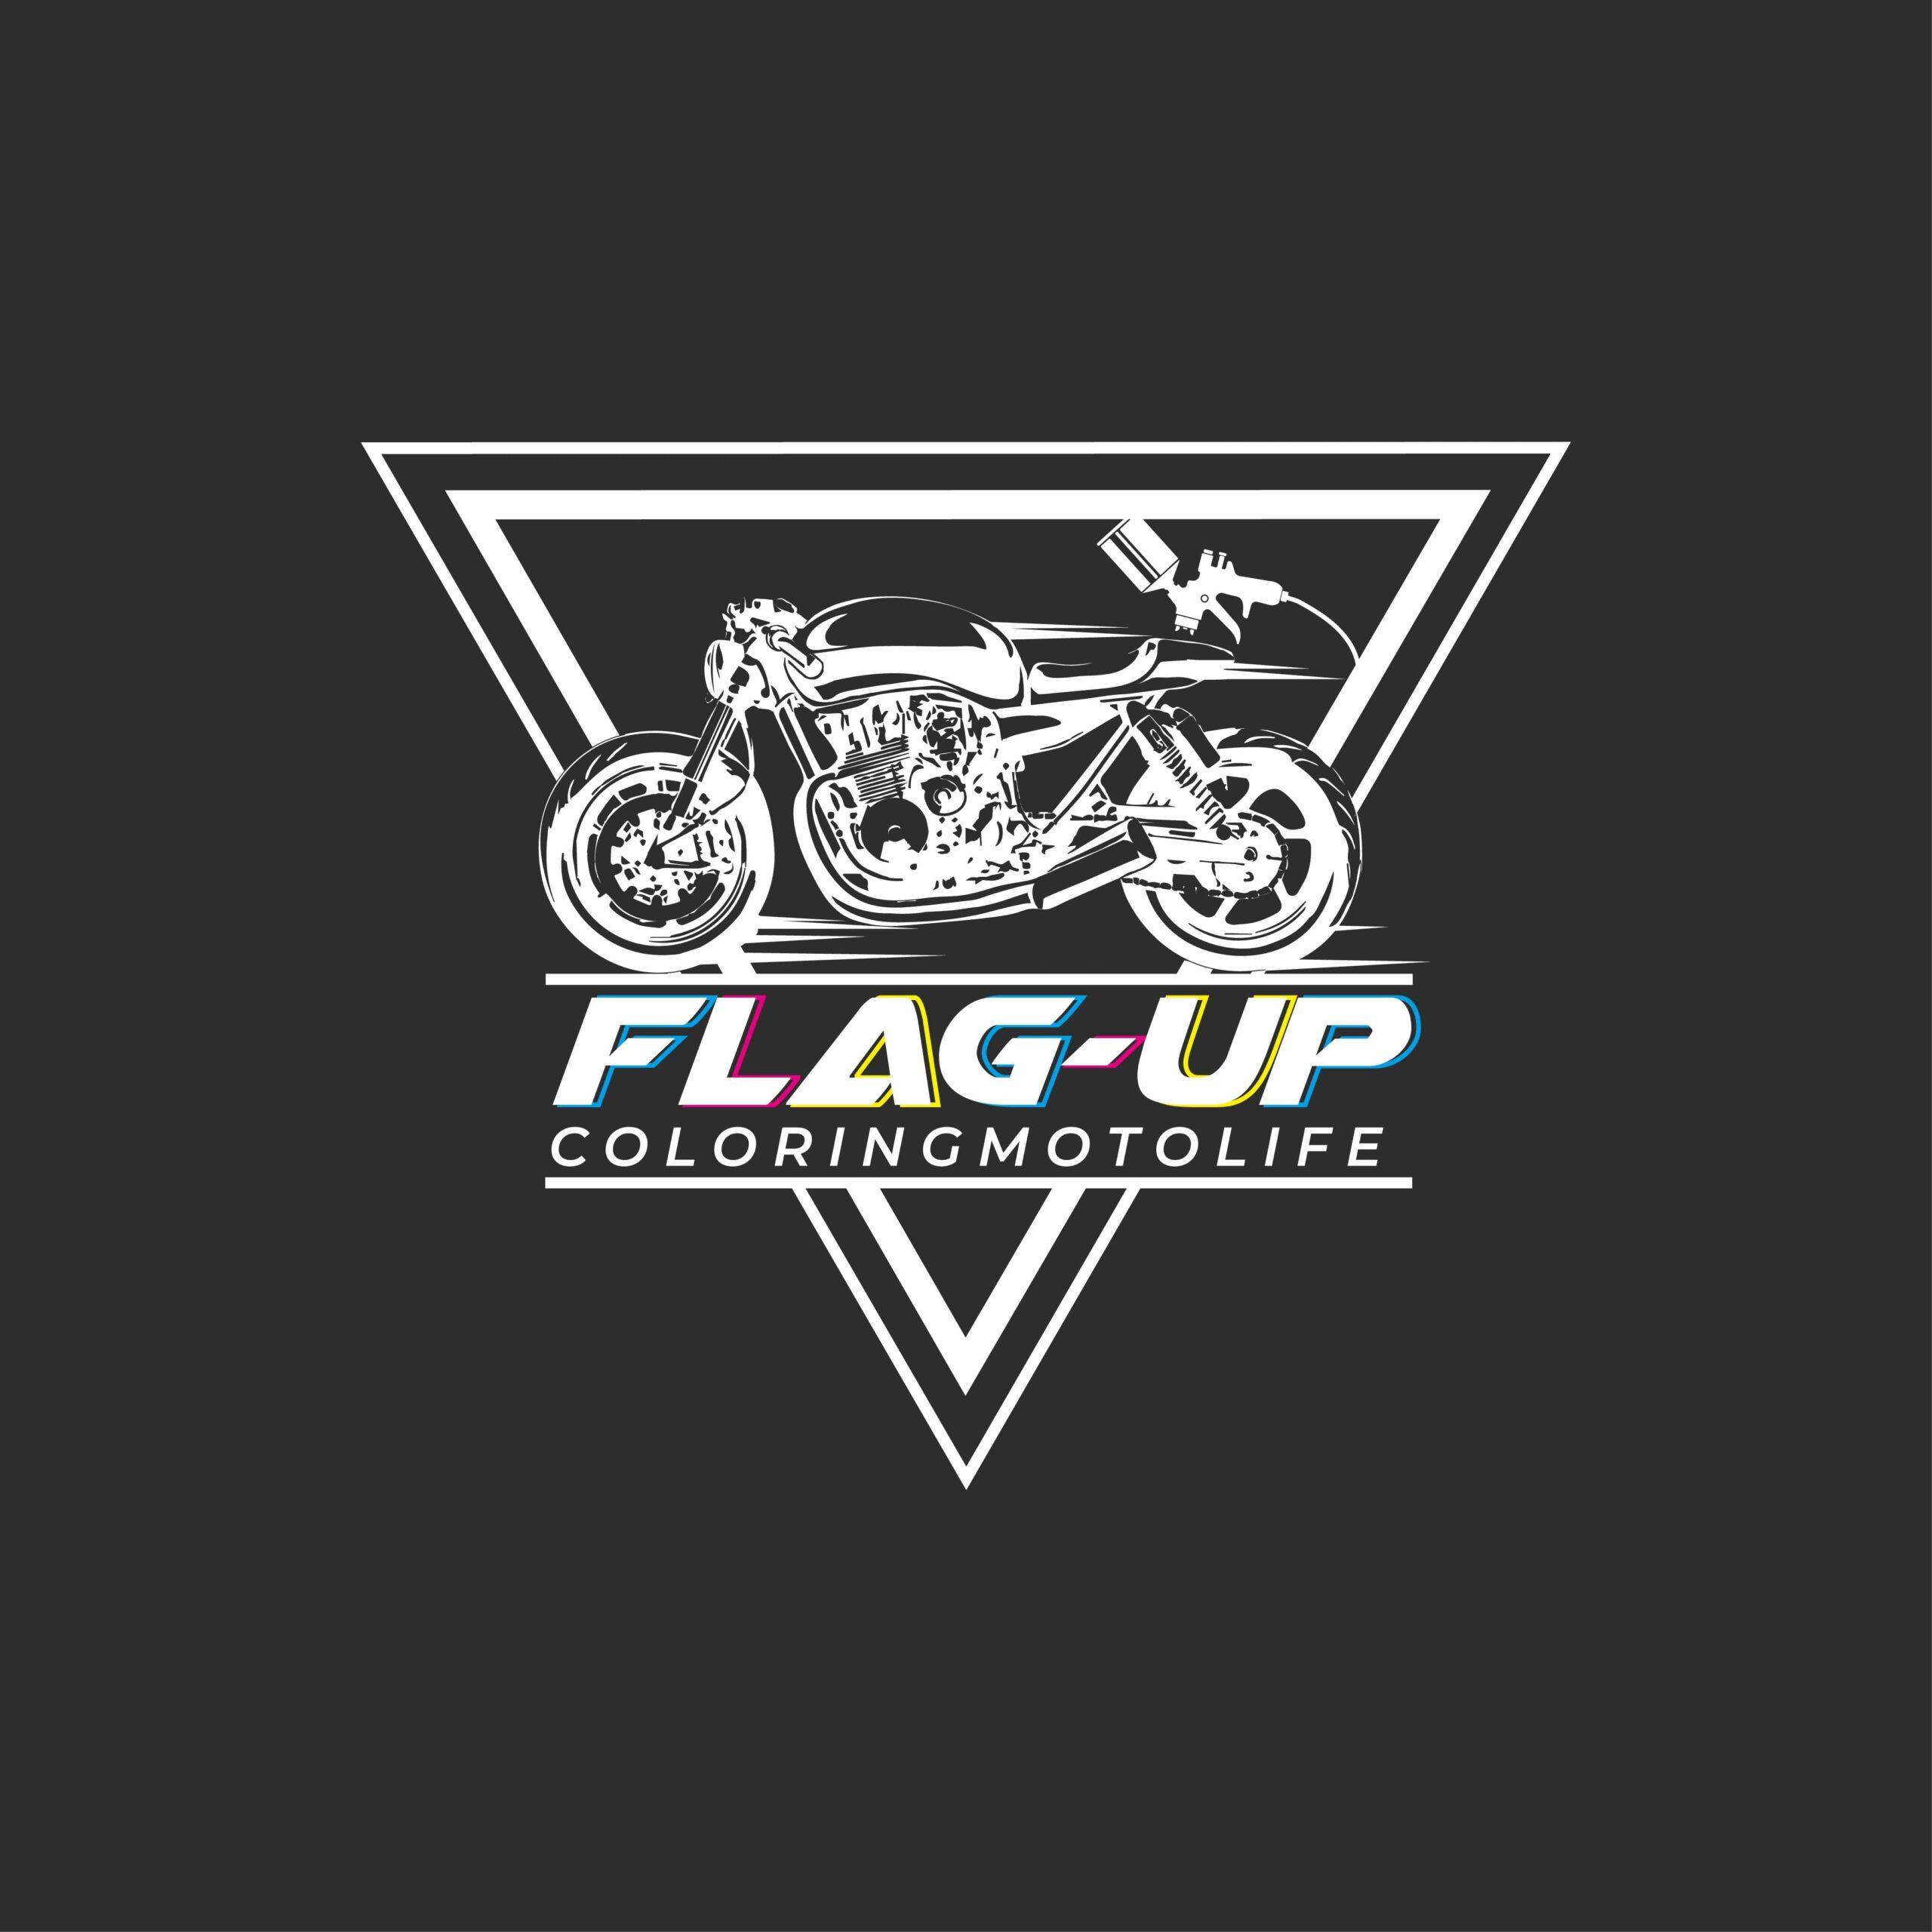 flagup